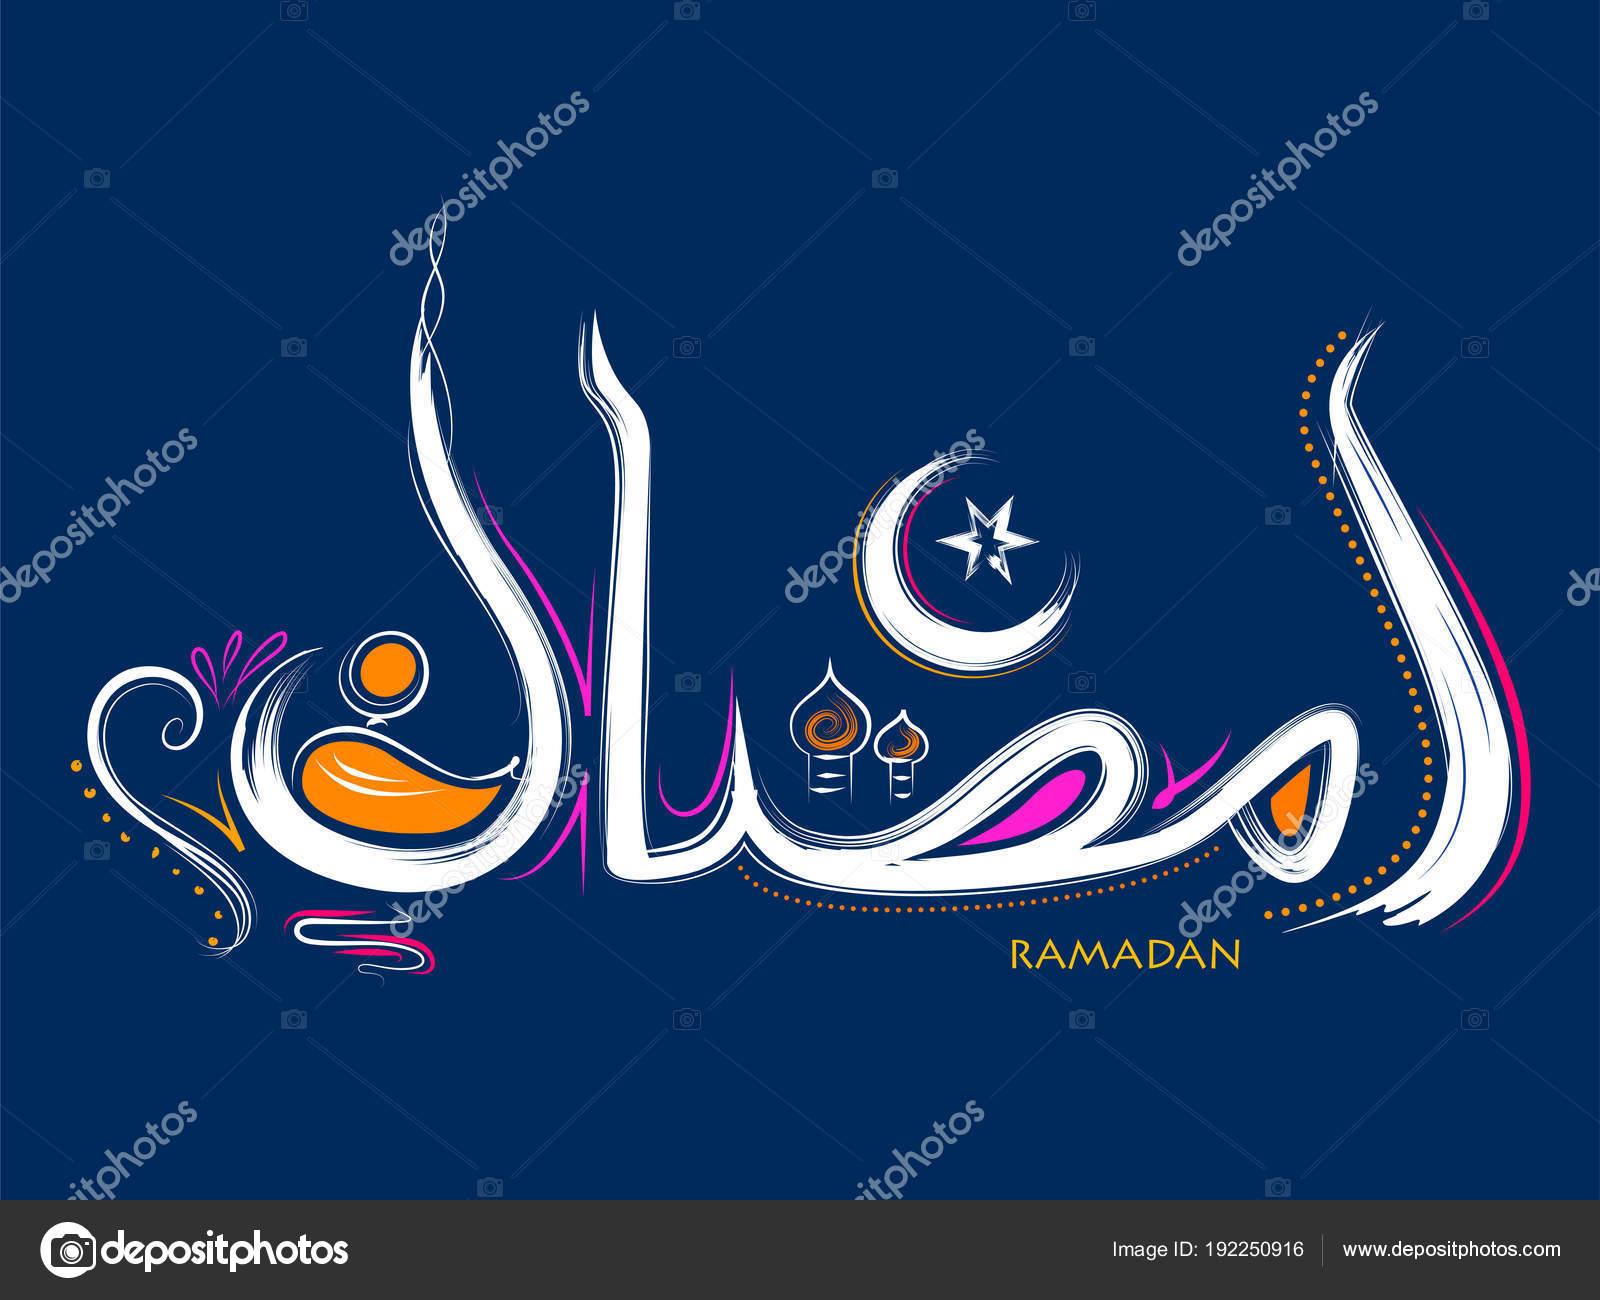 Ramadan kareem generous ramadan greeting with illuminated lamp illustration of ramadan kareem generous ramadan greeting in arabic freehand with illuminated lamp vector by vectomart m4hsunfo